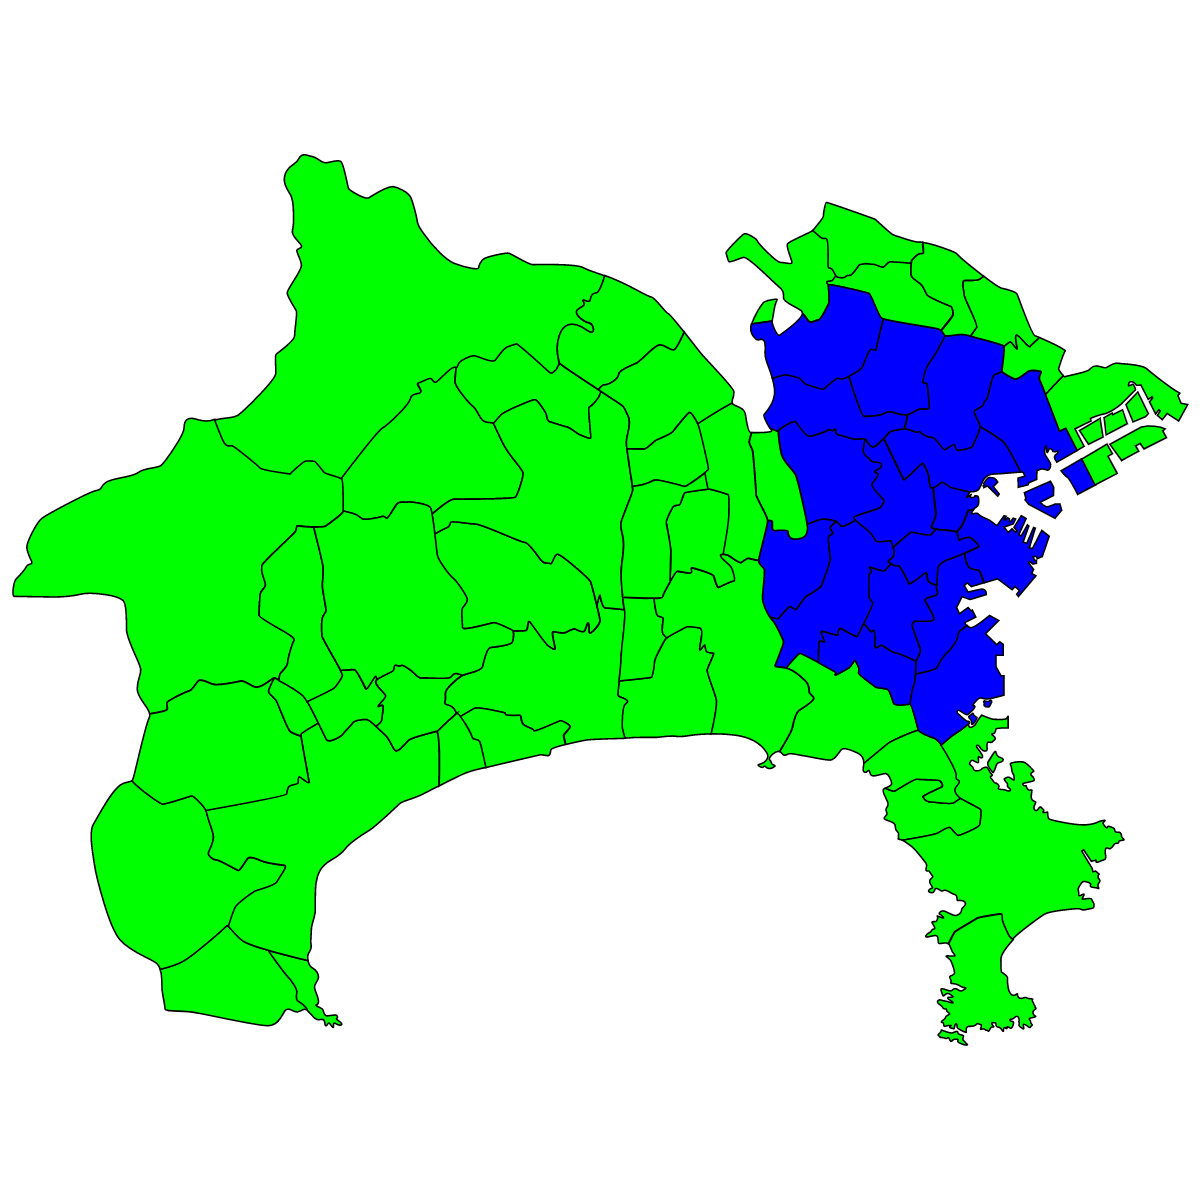 神奈川県全域に対応